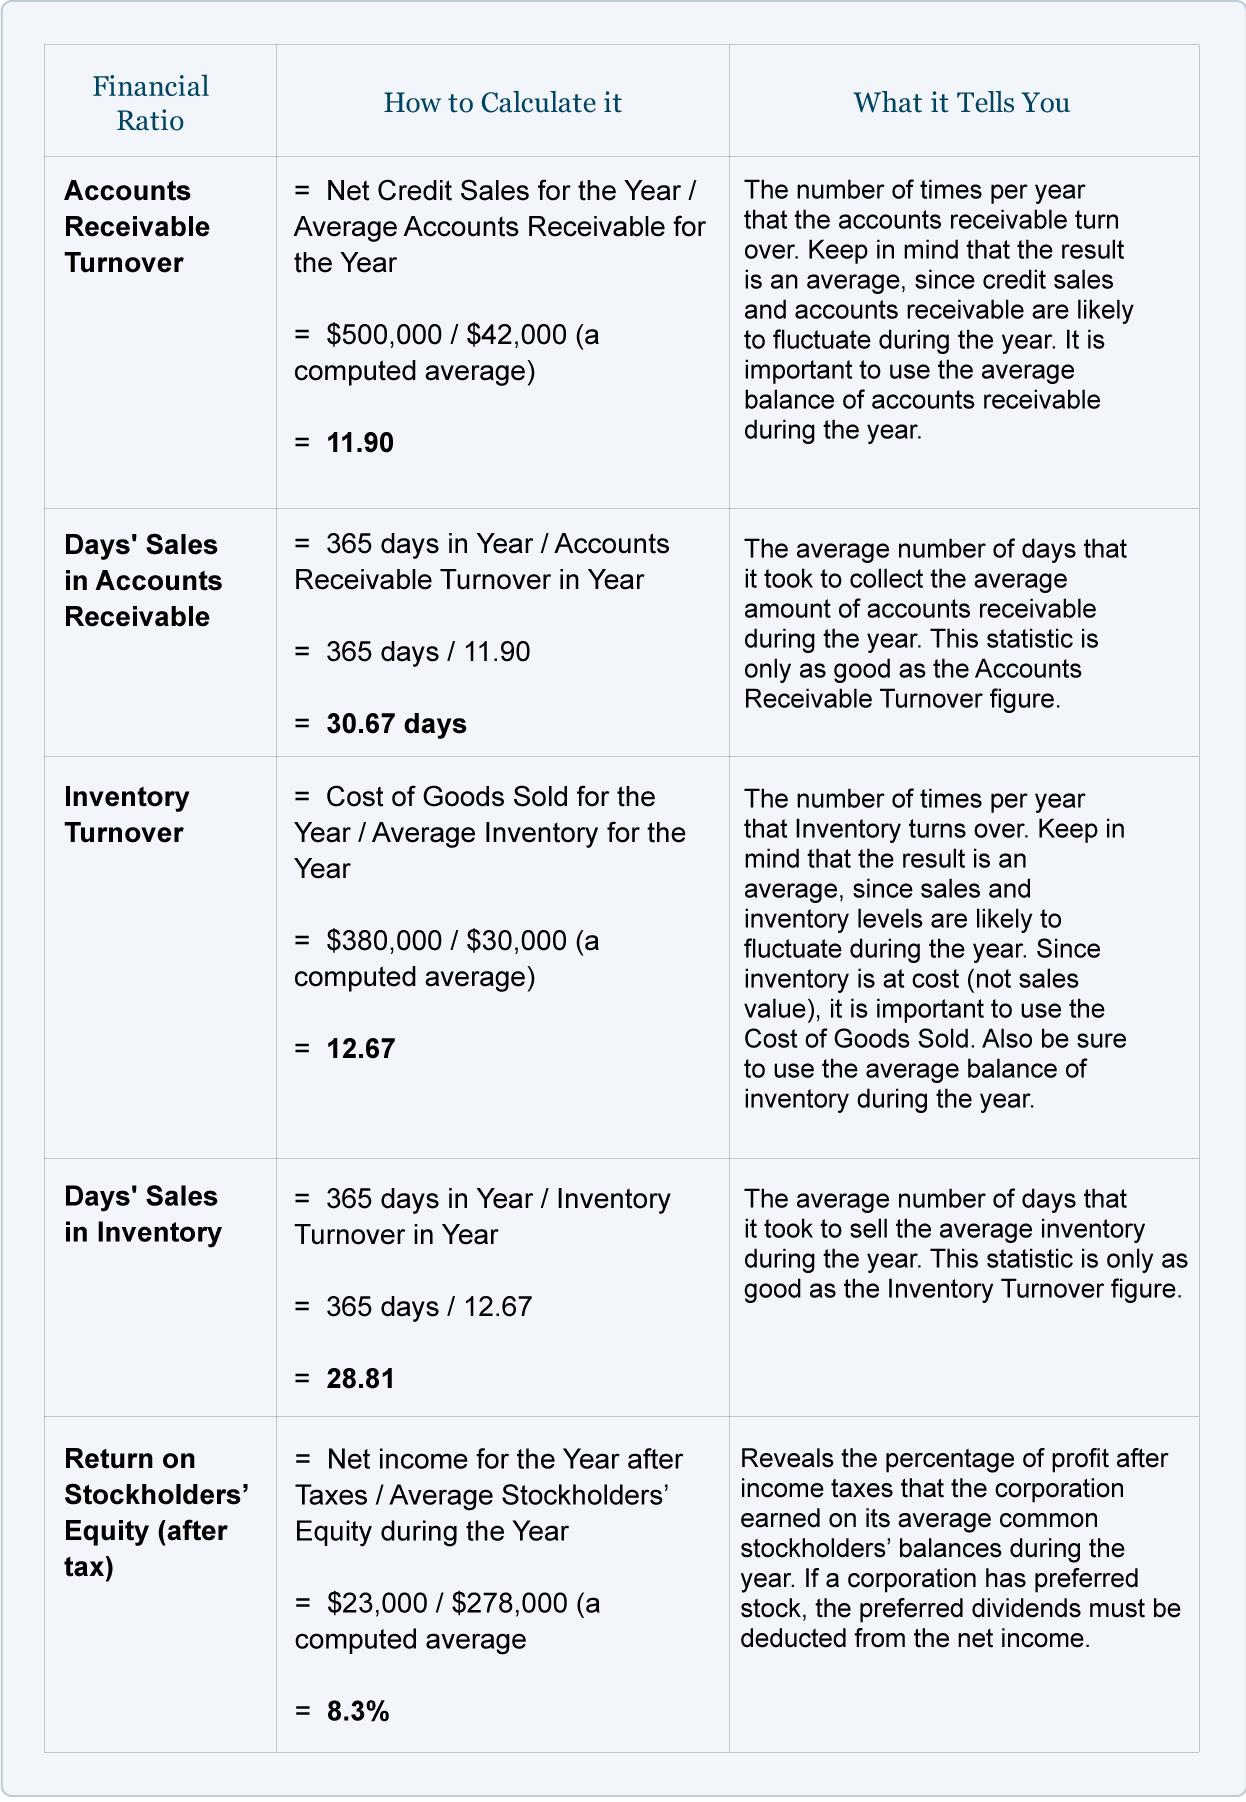 Financial Ratios Balance Sheet AccountingCoach